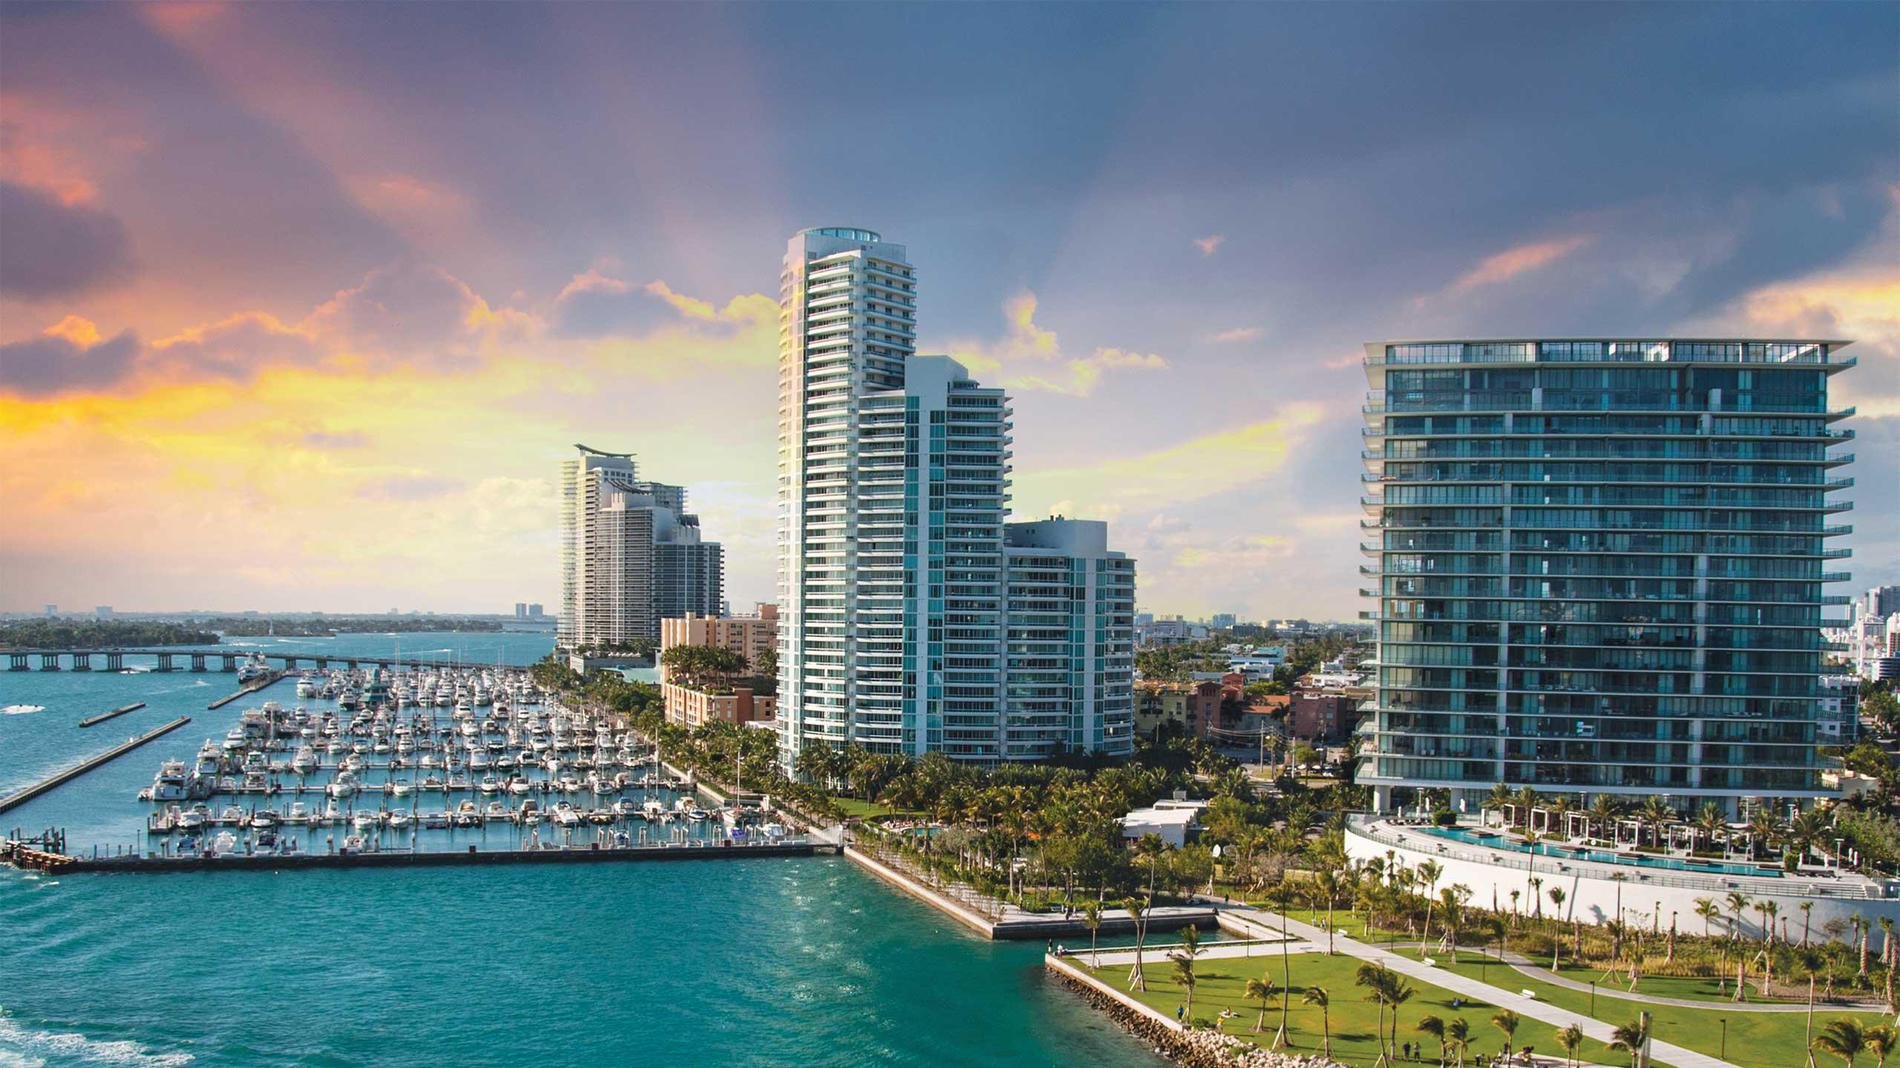 Morgan Stanley Boca Raton Branch | Boca Raton, FL